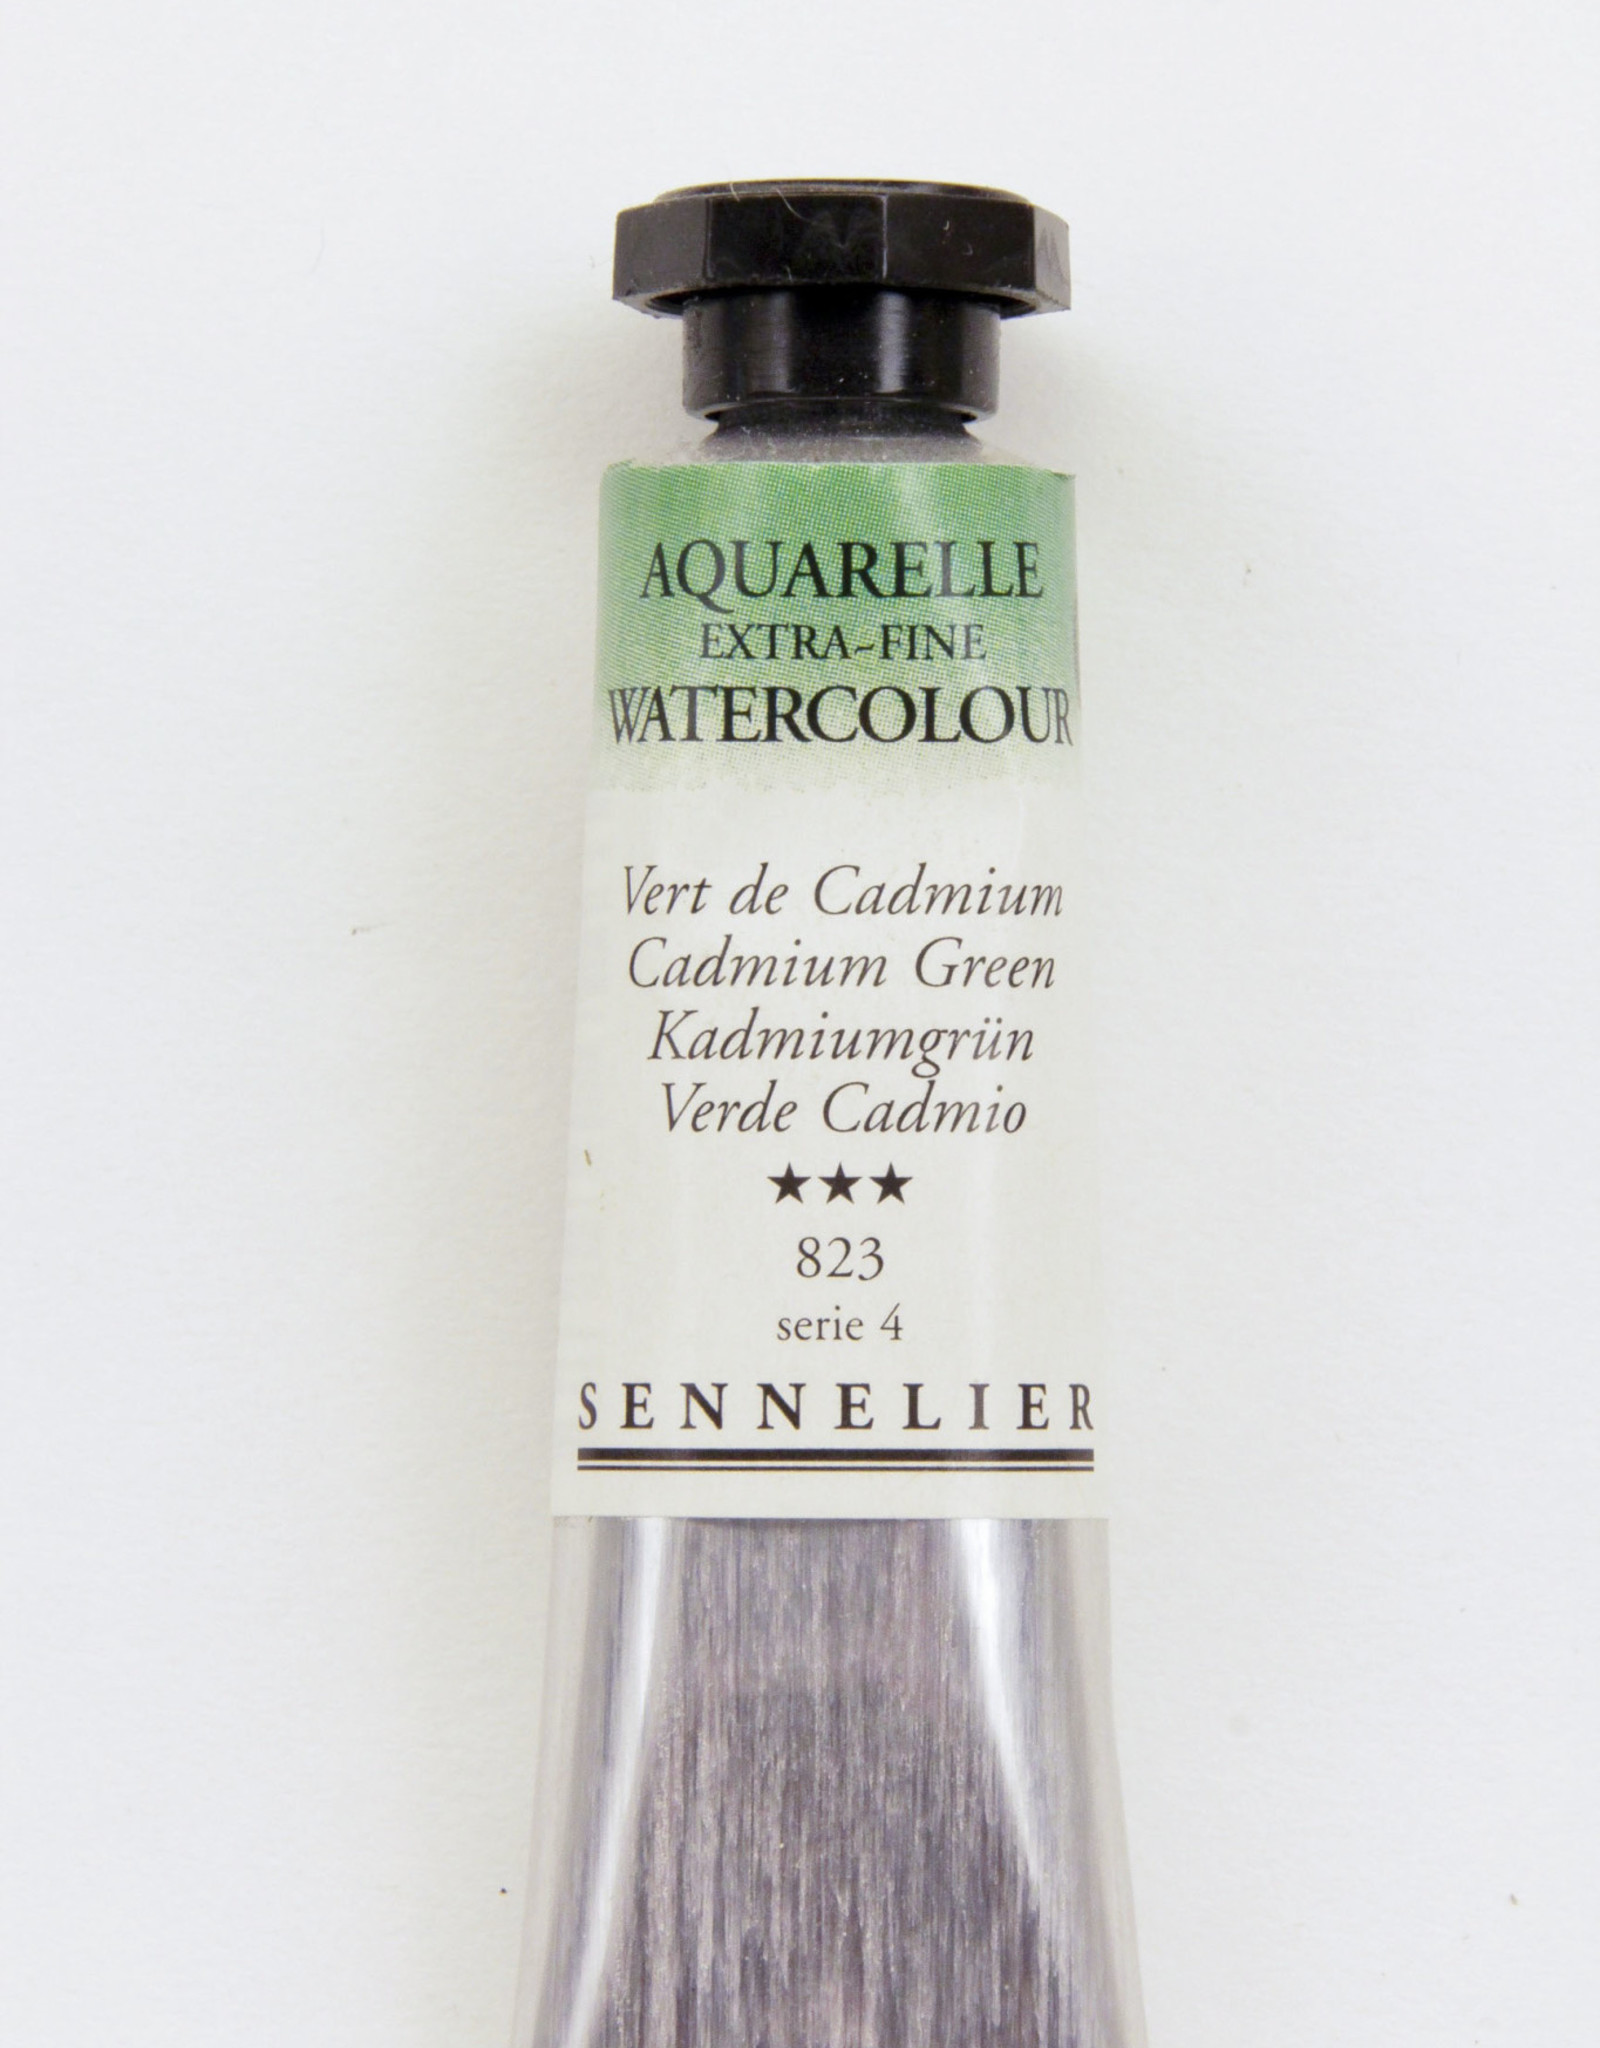 Sennelier, Aquarelle Watercolor Paint, Cadmium Green, 823, 10ml Tube, Series 4